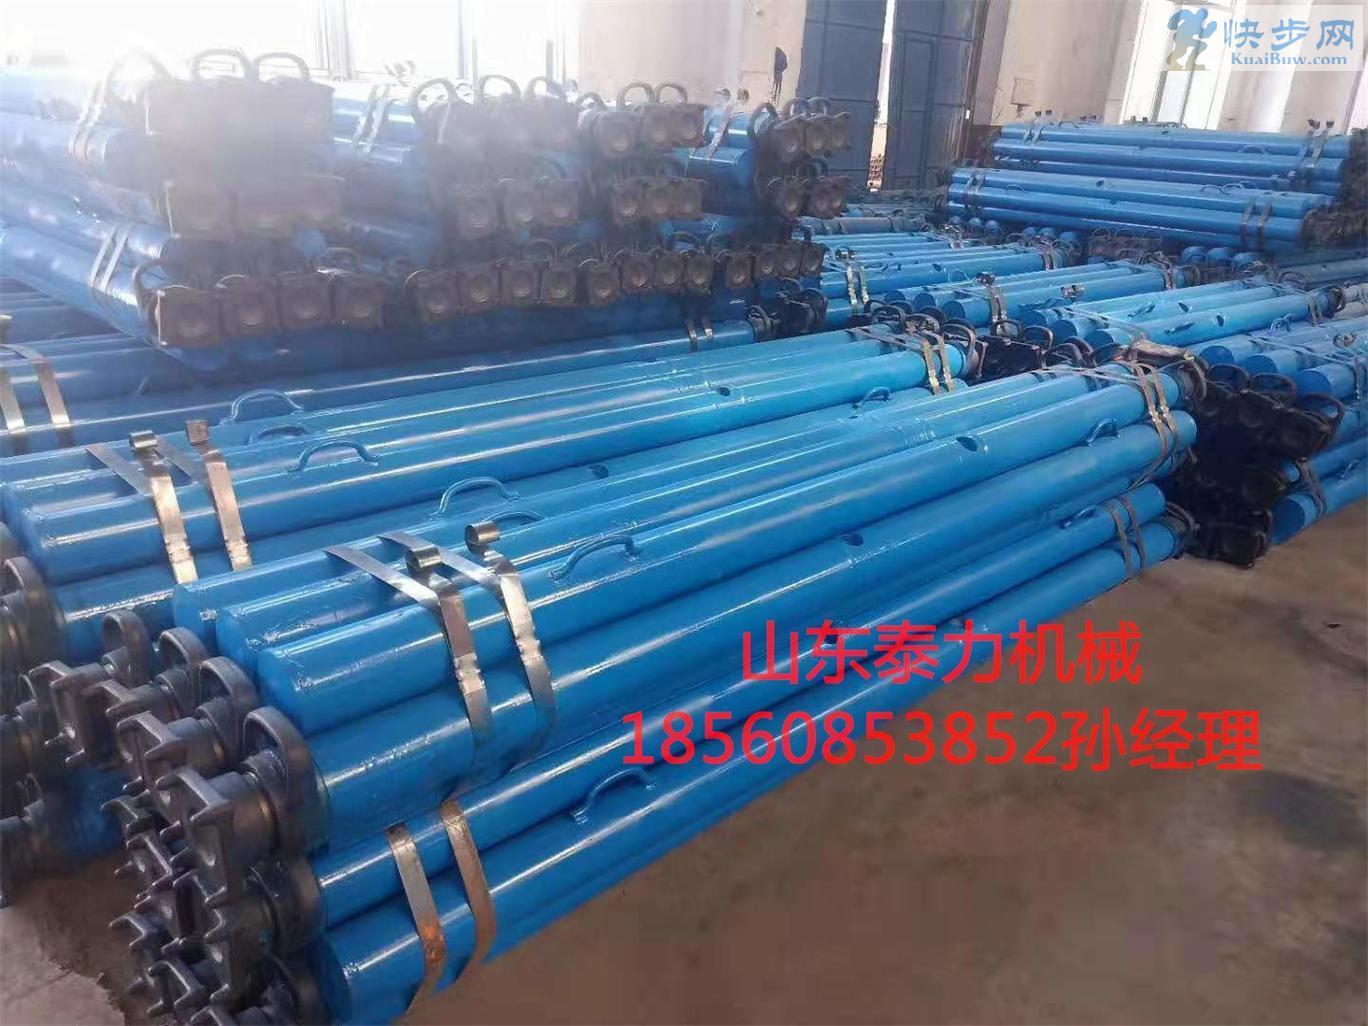 DW40-250 110X轻型环保单体液压支柱